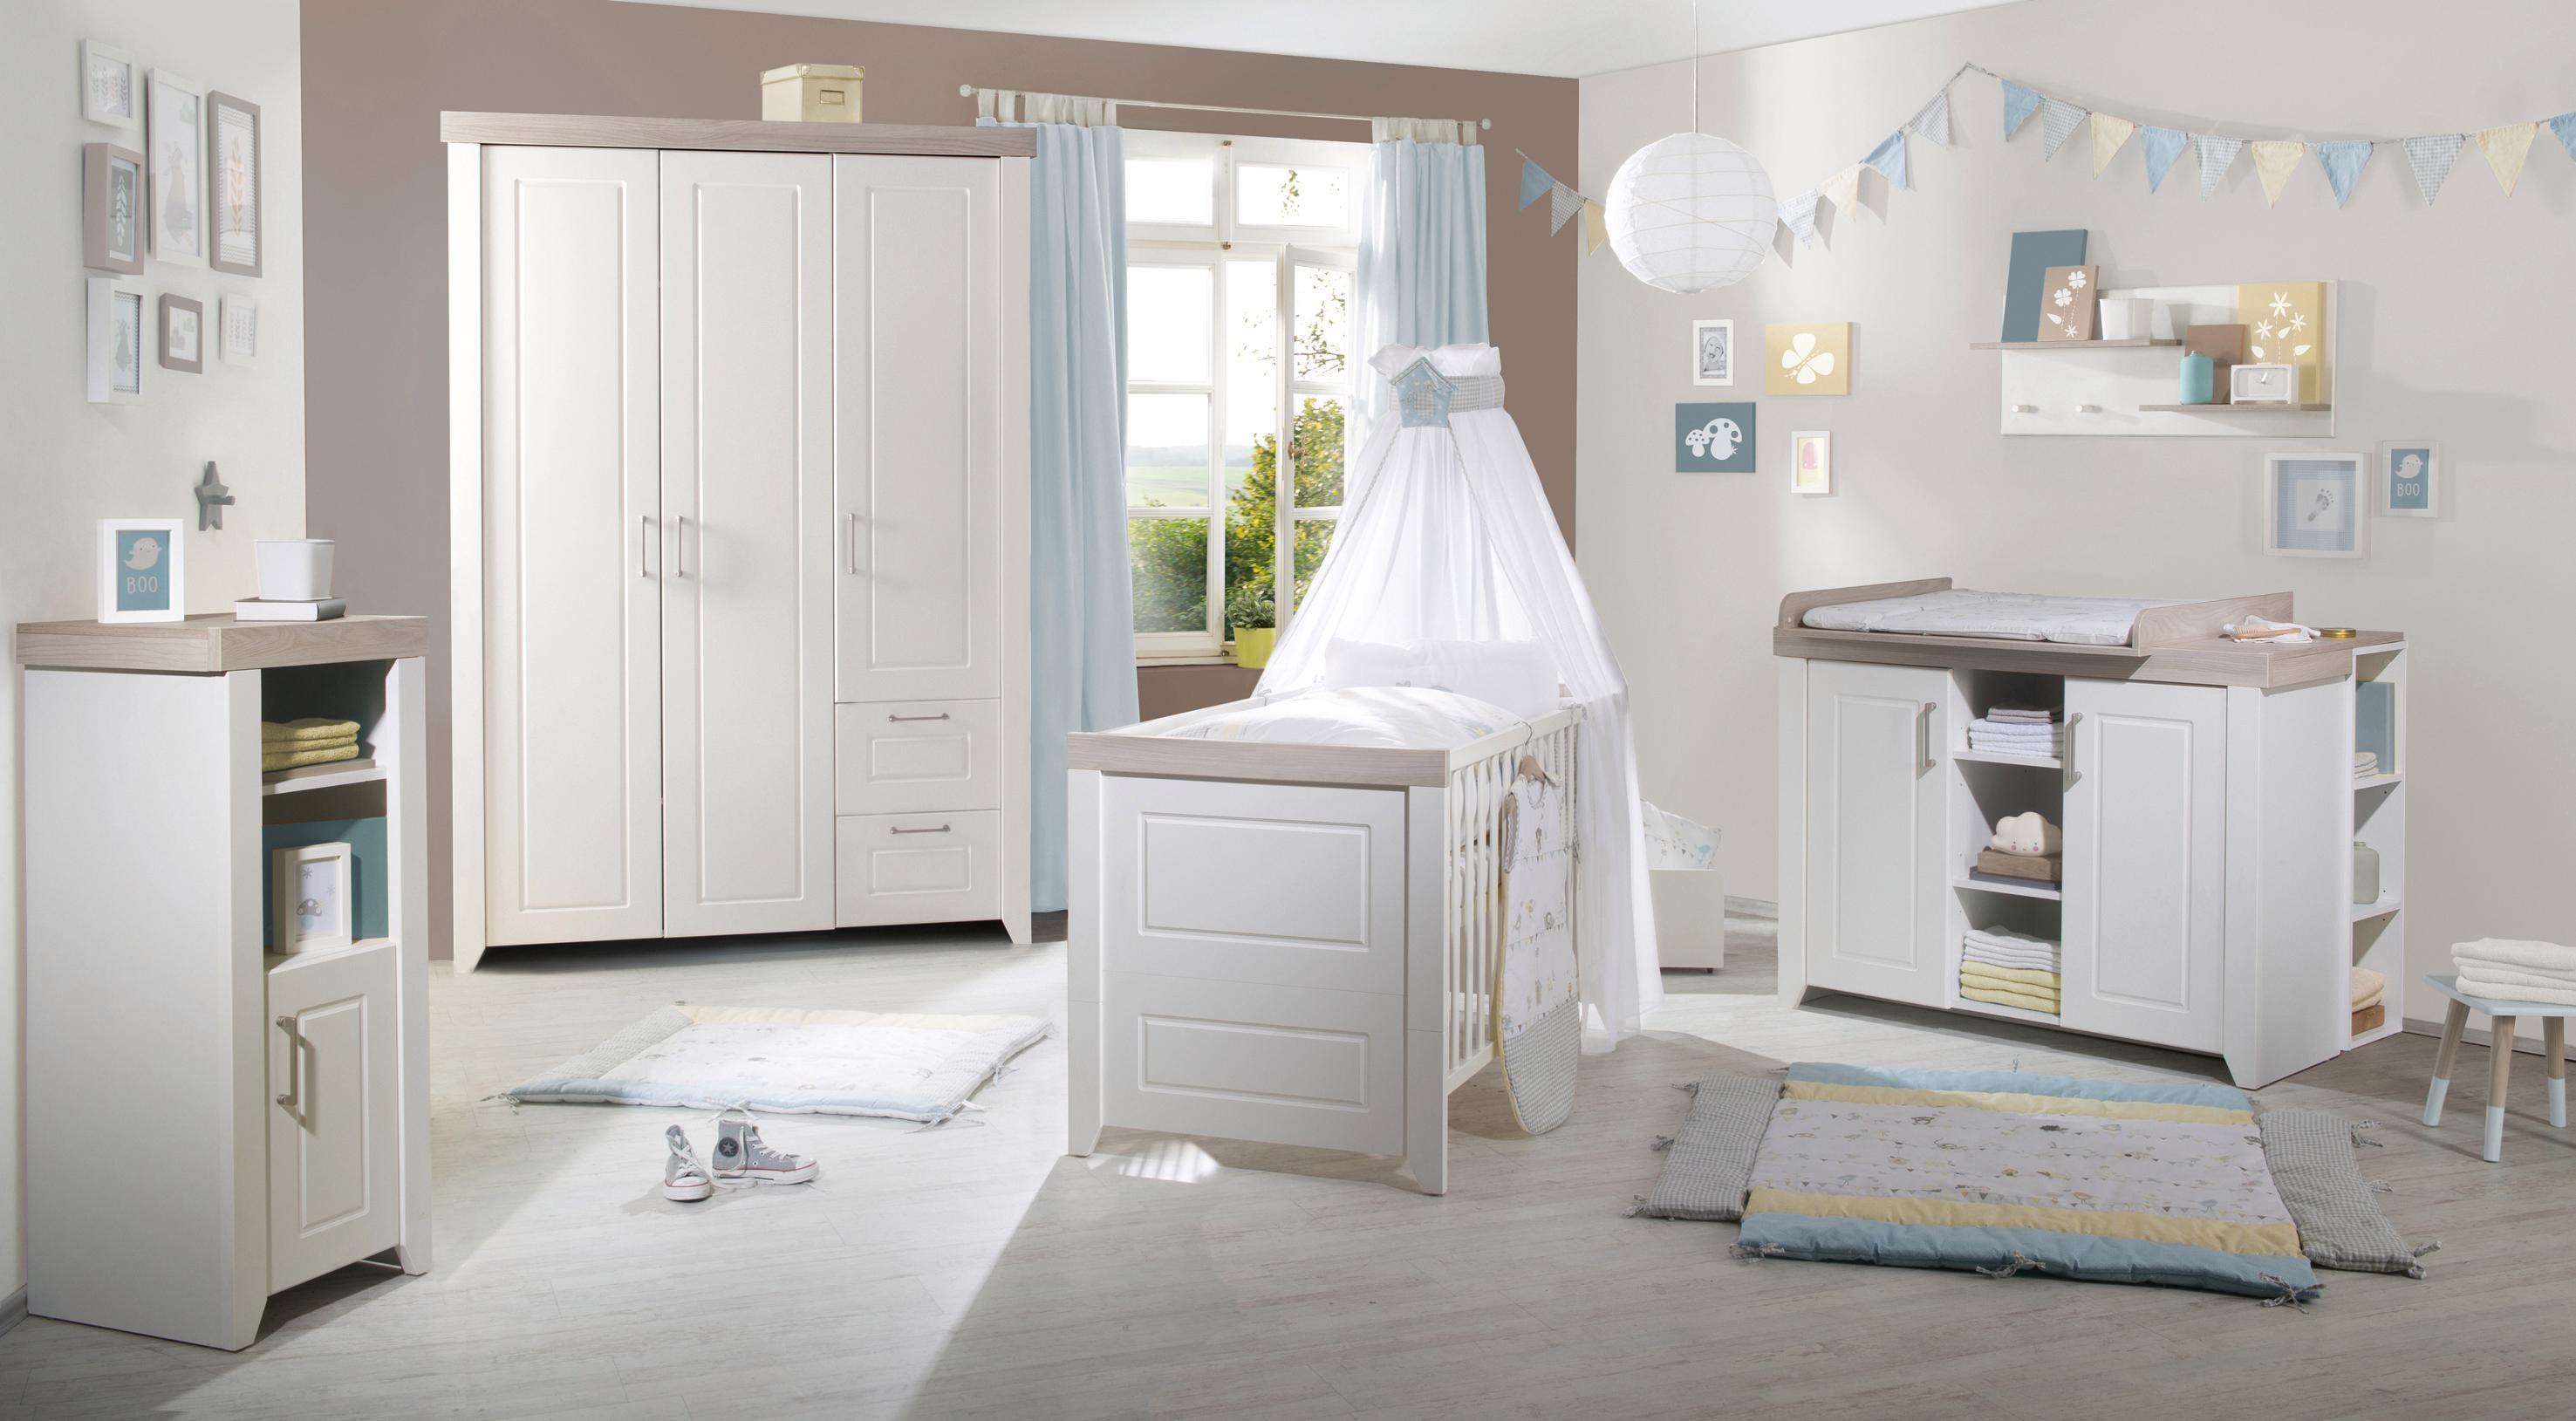 Roba Babyzimmer Set (3-tlg) Kinderzimmer »Felicia« | Kinderzimmer > Babymöbel > Komplett-Babyzimmer | Weiß | Metall - Abs - Spanplatte - Mdf | ROBA